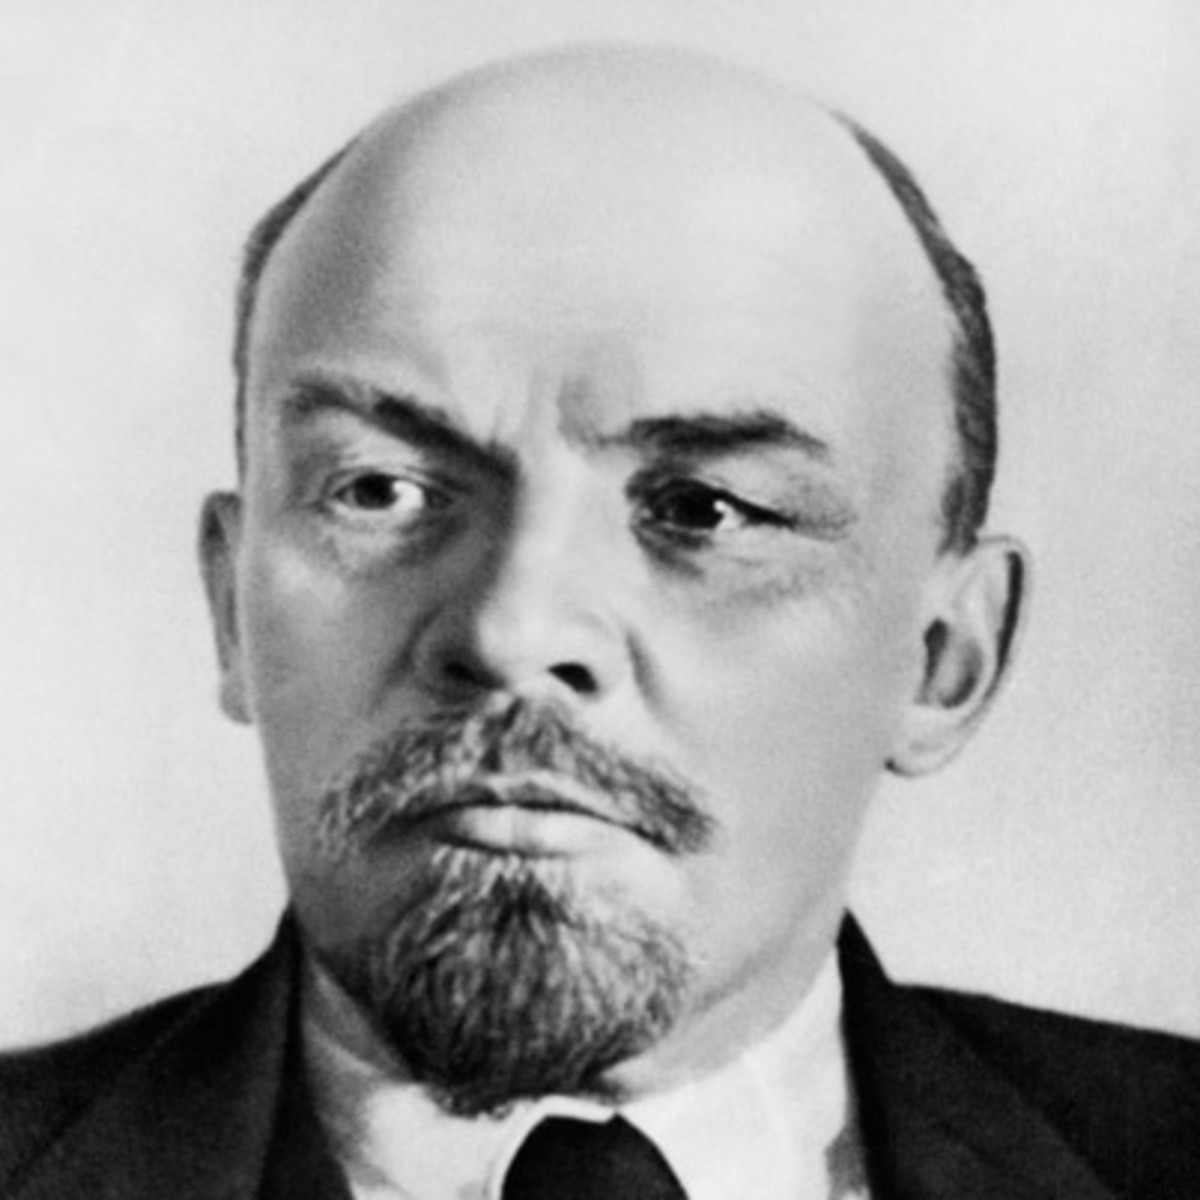 Official Soviet photo of Vladimir Lenin; first leader of the Soviet Union.